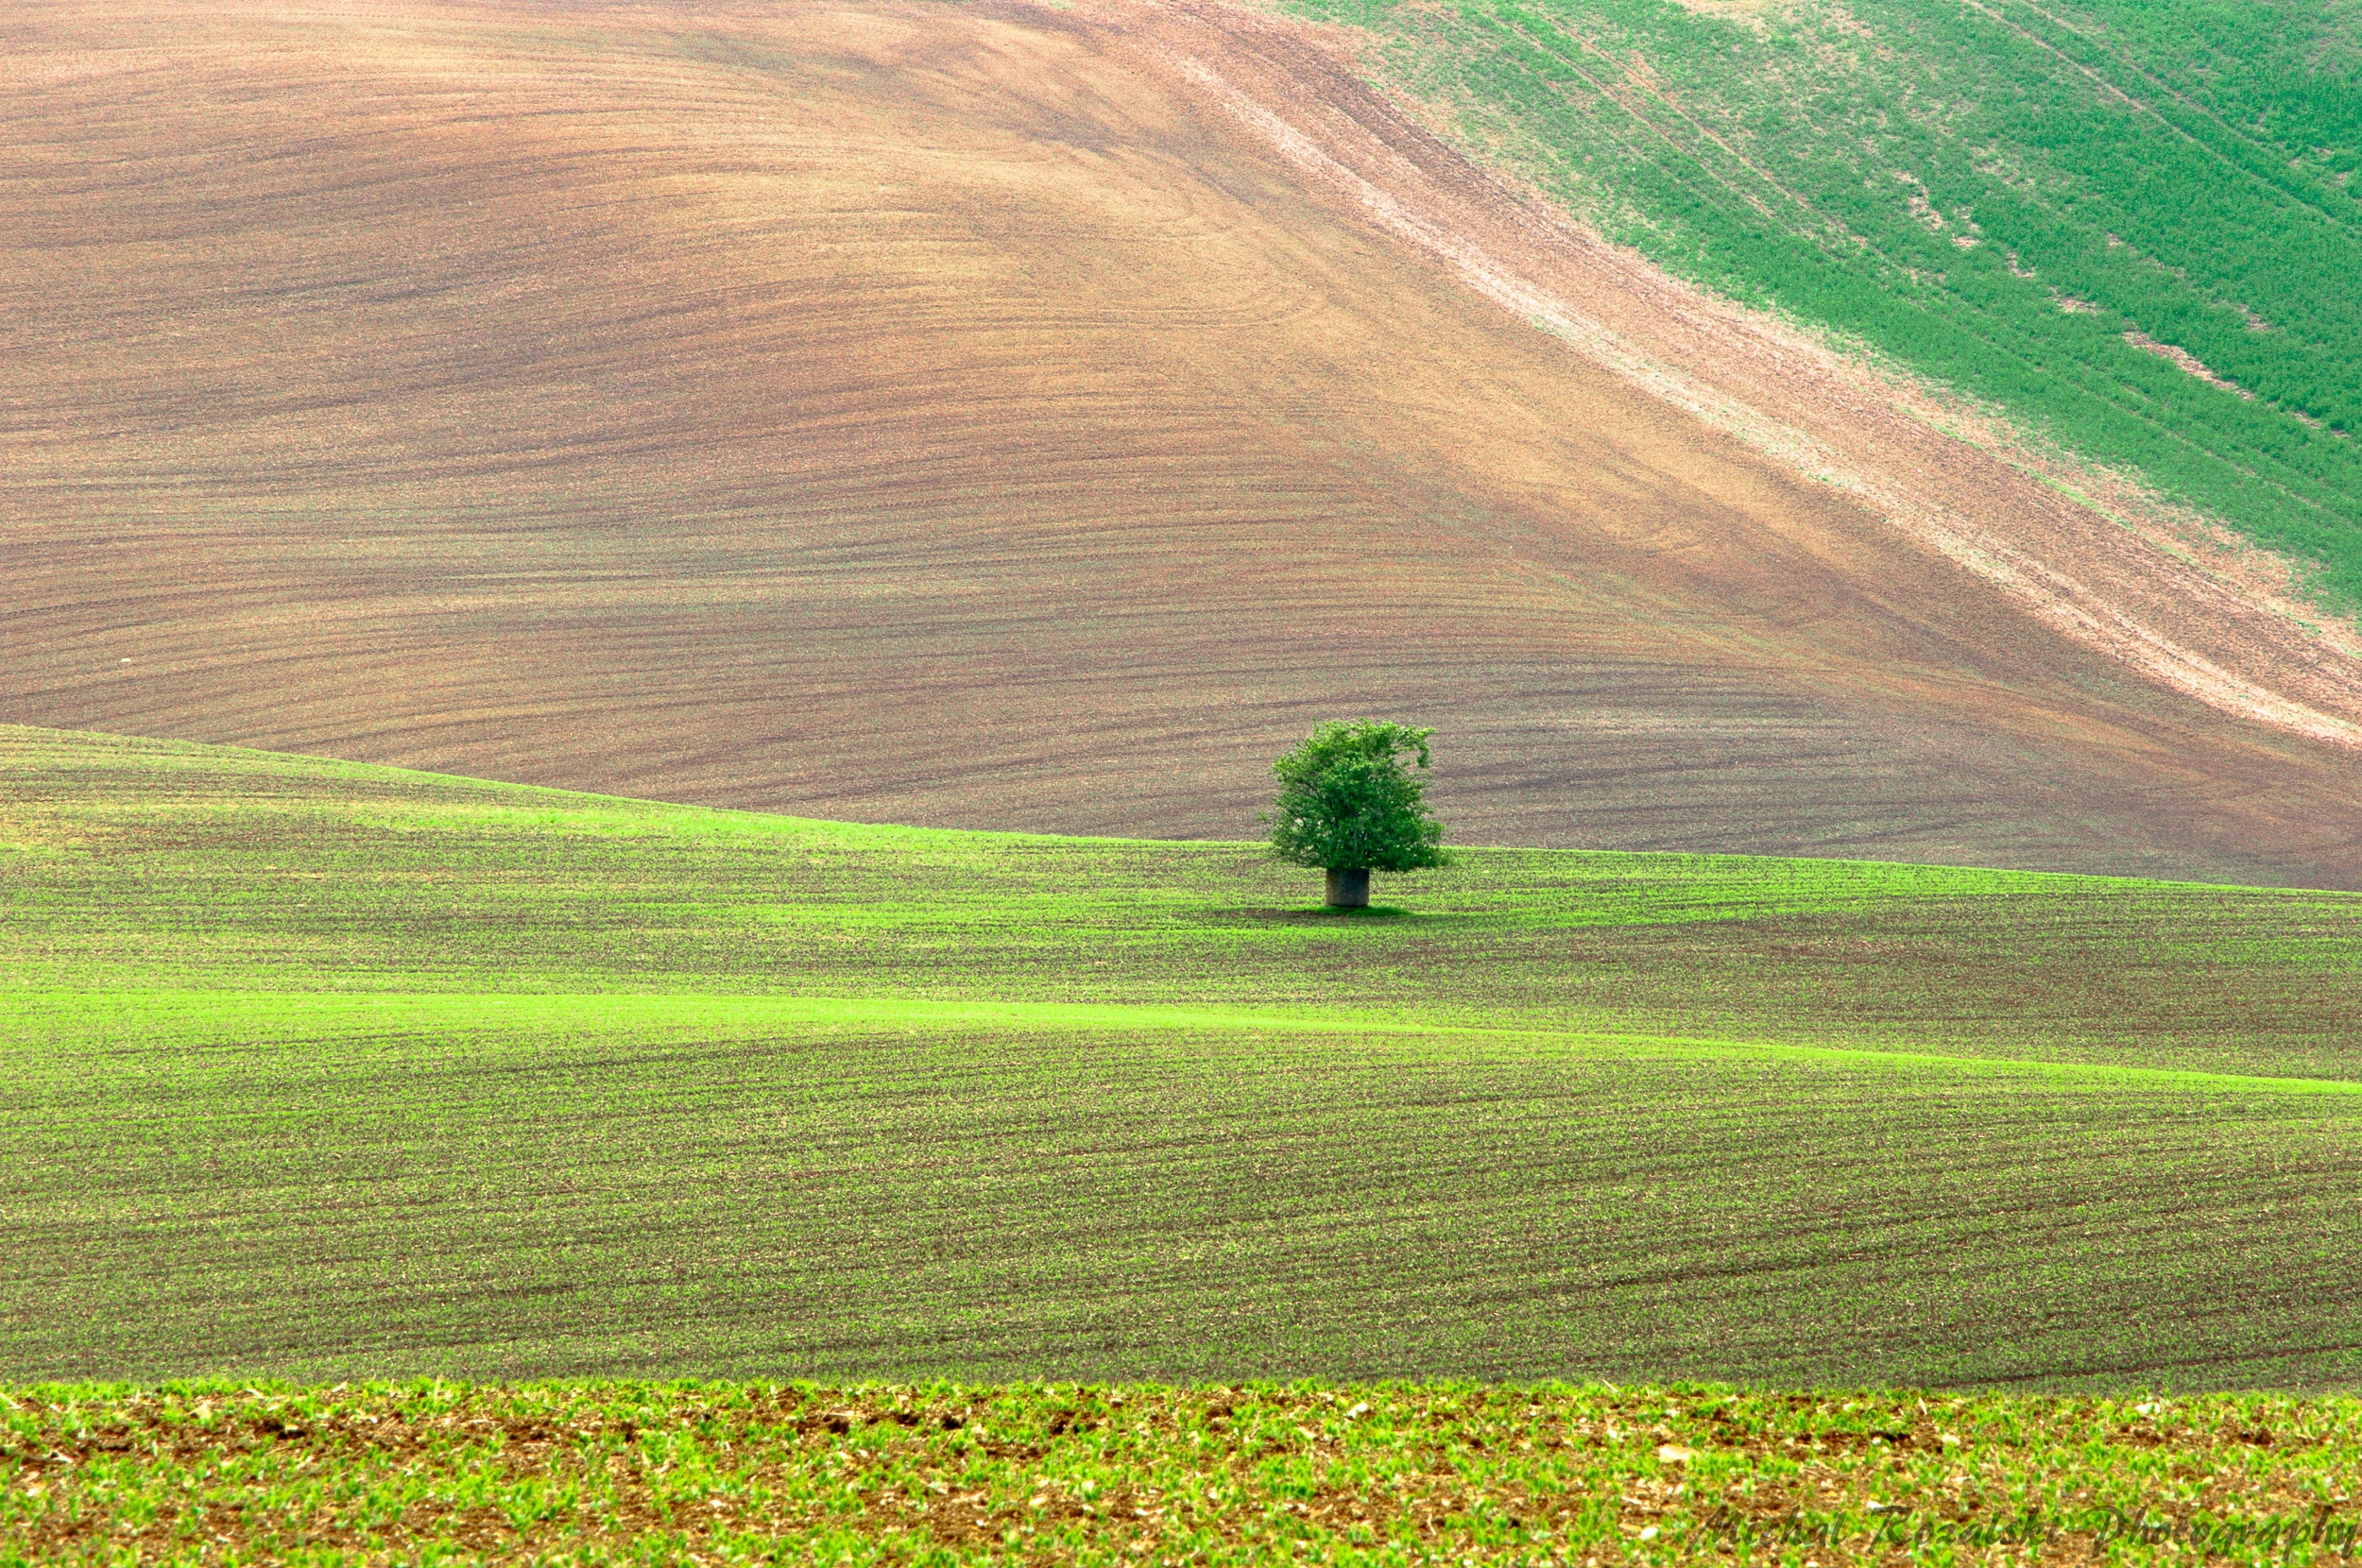 moravia, ,hills, ,spring, ,season, ,colors, ,tree, ,light, ,sunrise, ,fields, ,landscape, ,photography, Michal Rozalski